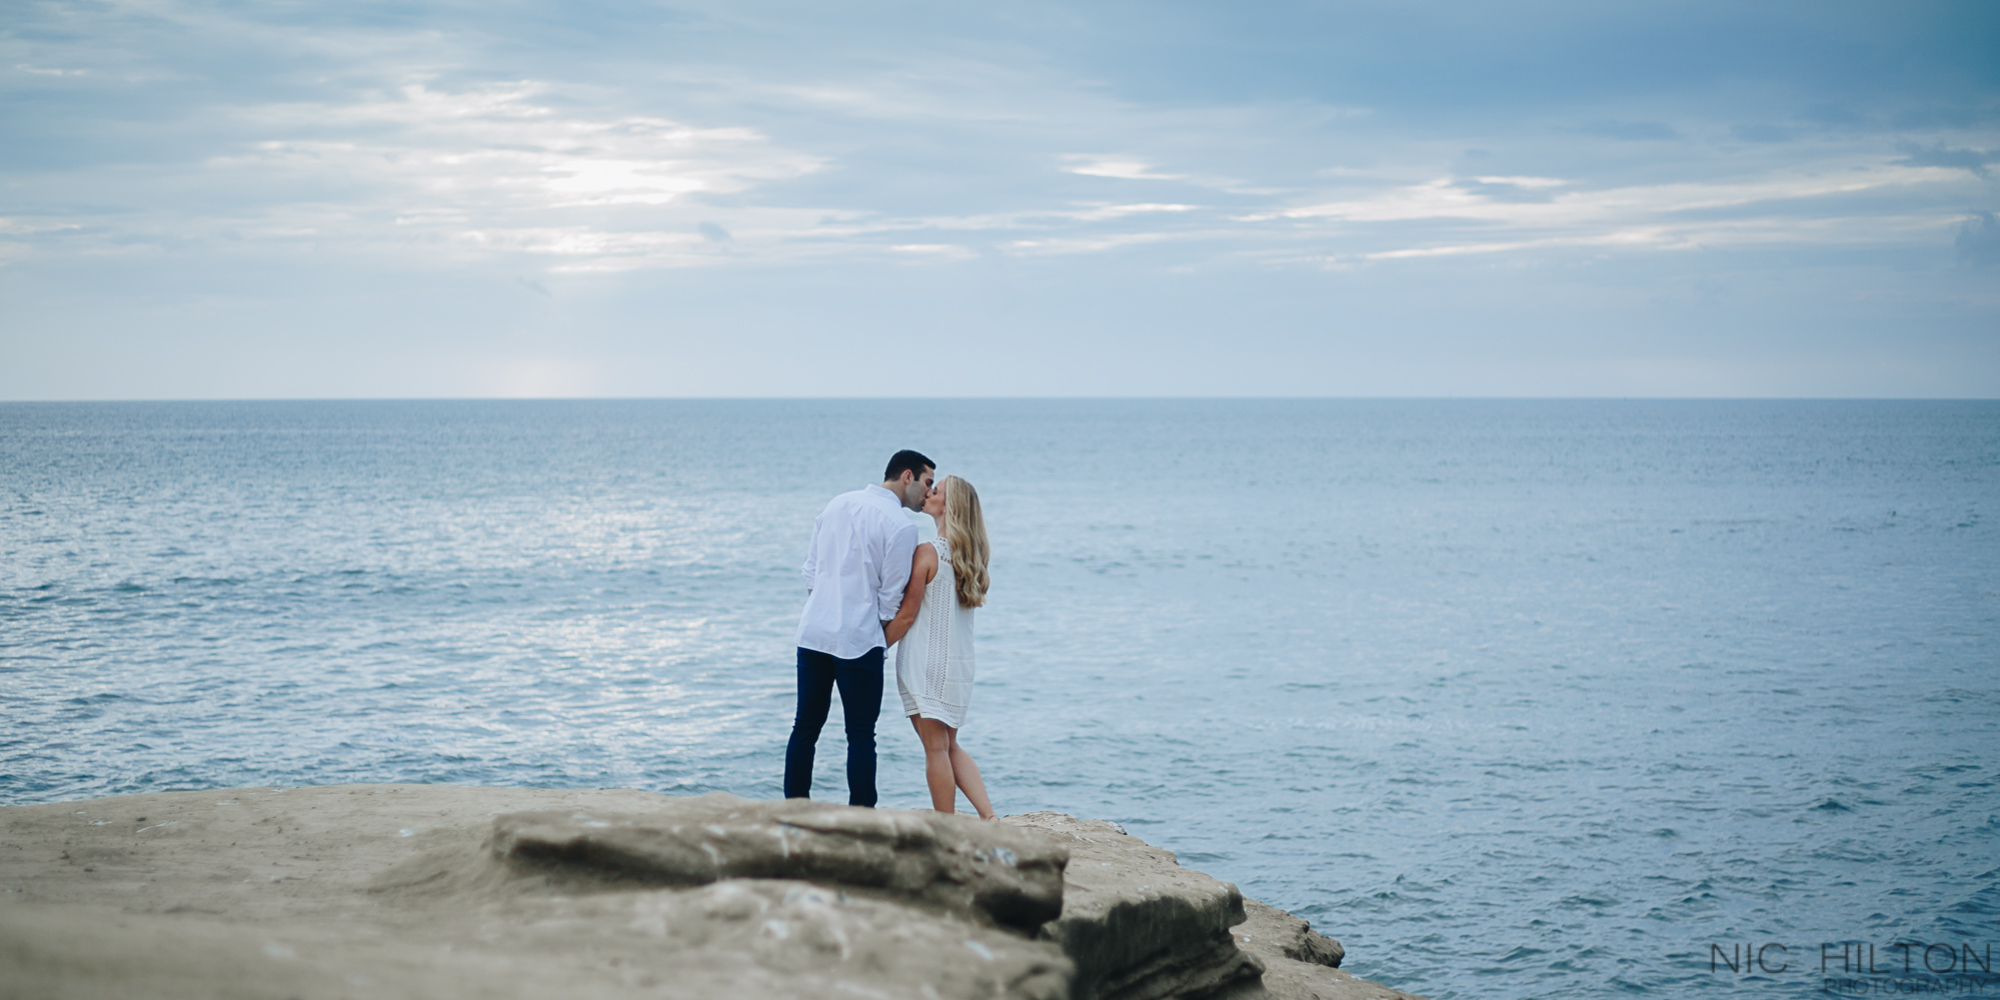 Sunset-Cliffs-San-Diego-Engagement-Photos.jpg